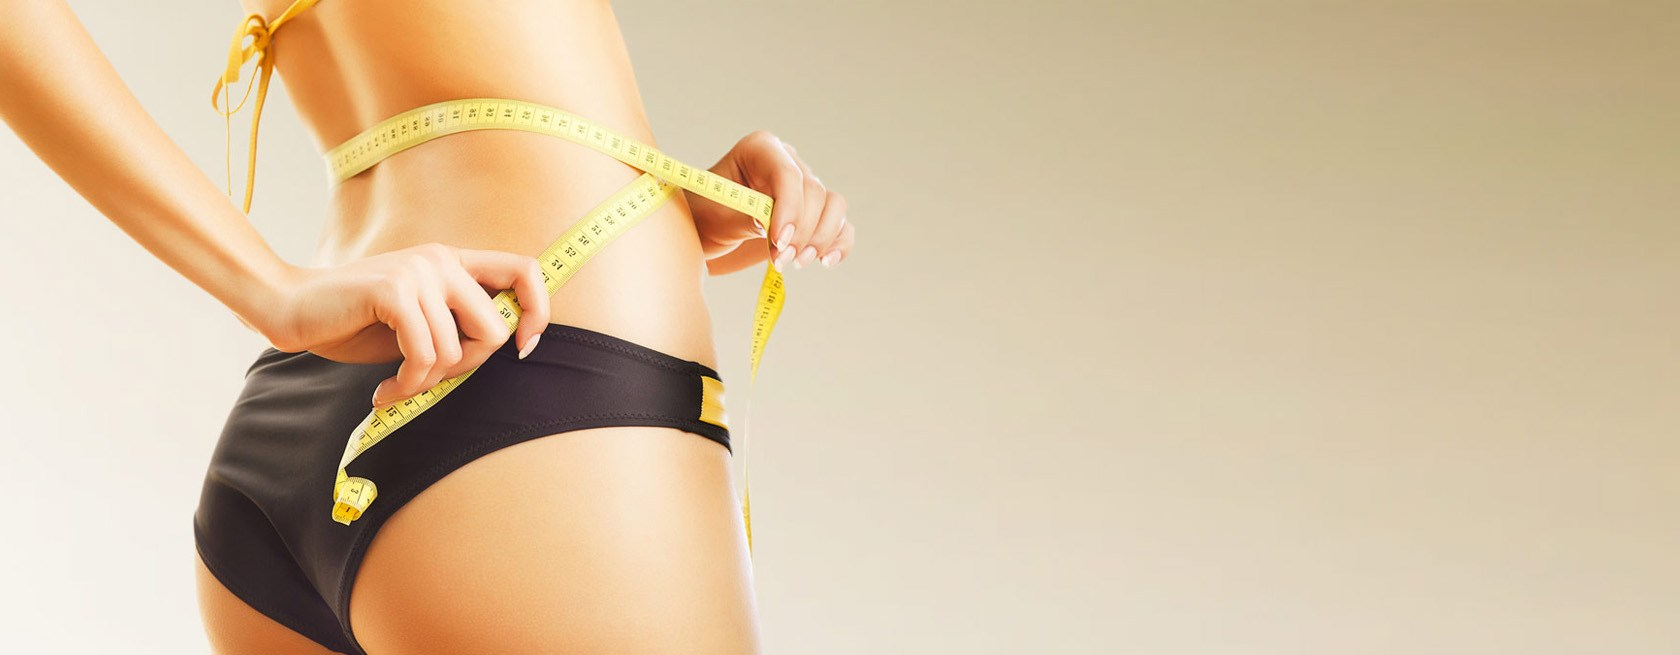 Hcg weight loss warner robins ga